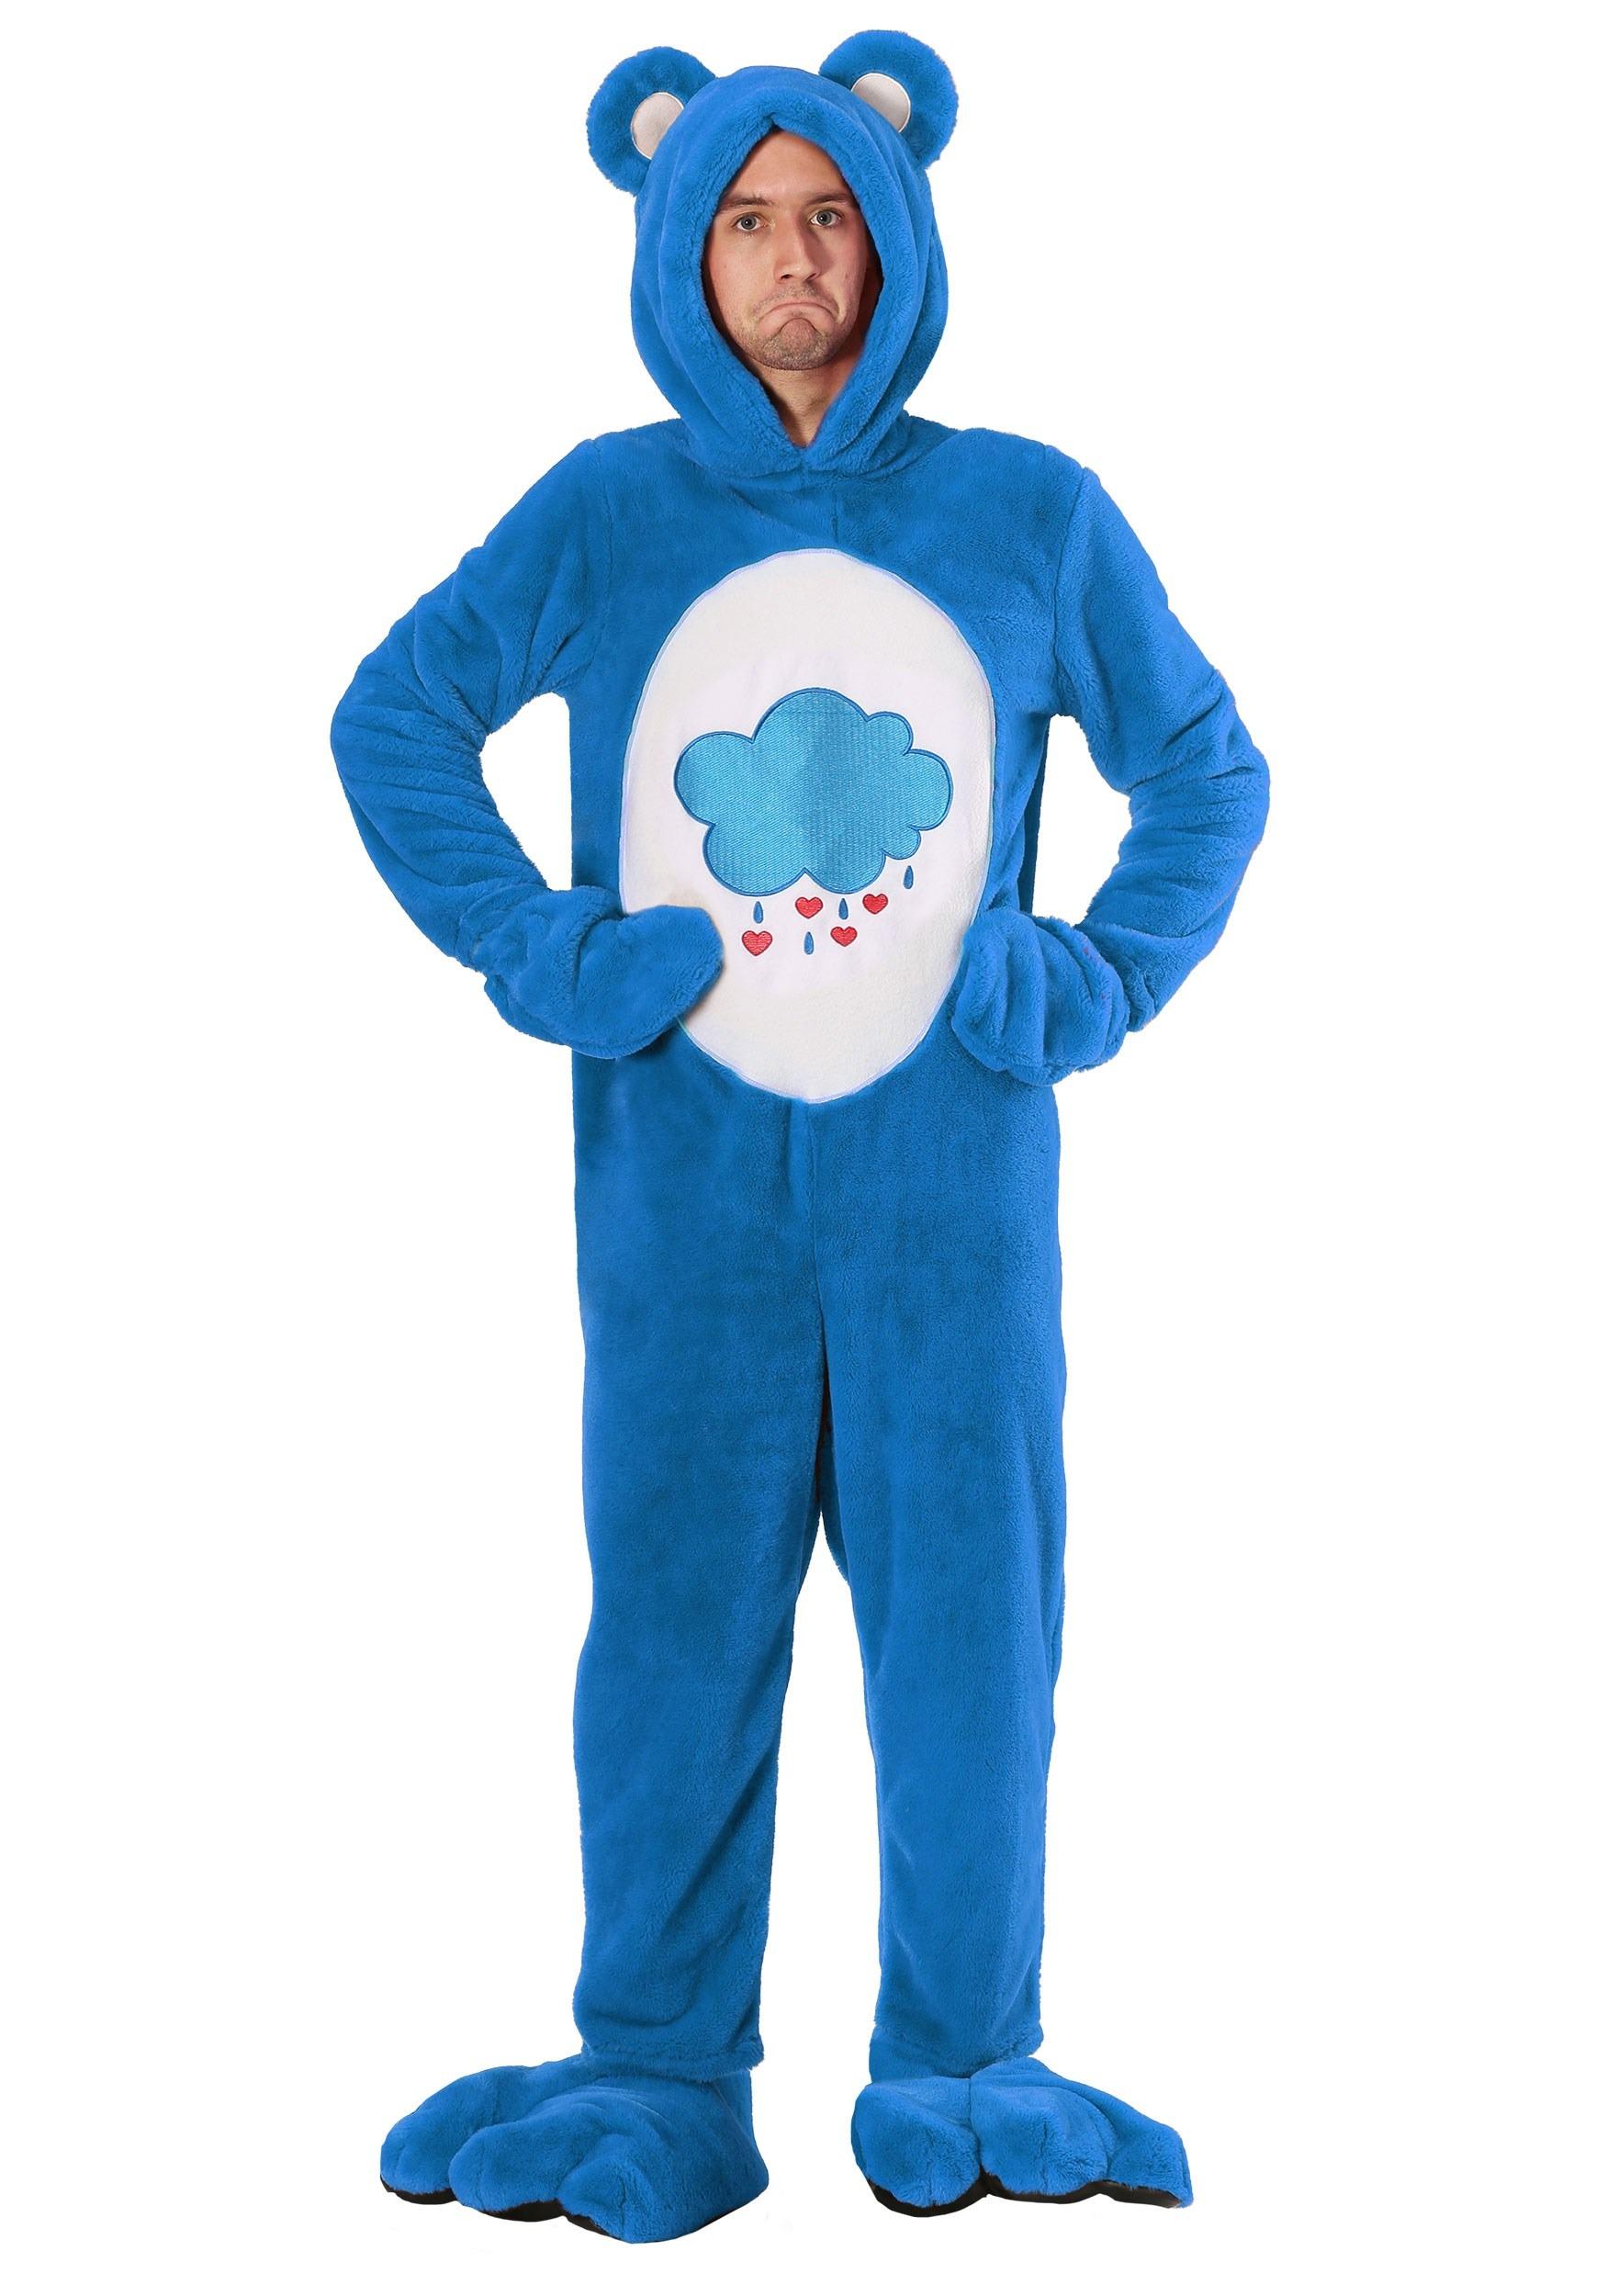 Plus Size: Care Bears Deluxe Grumpy Bear Costume